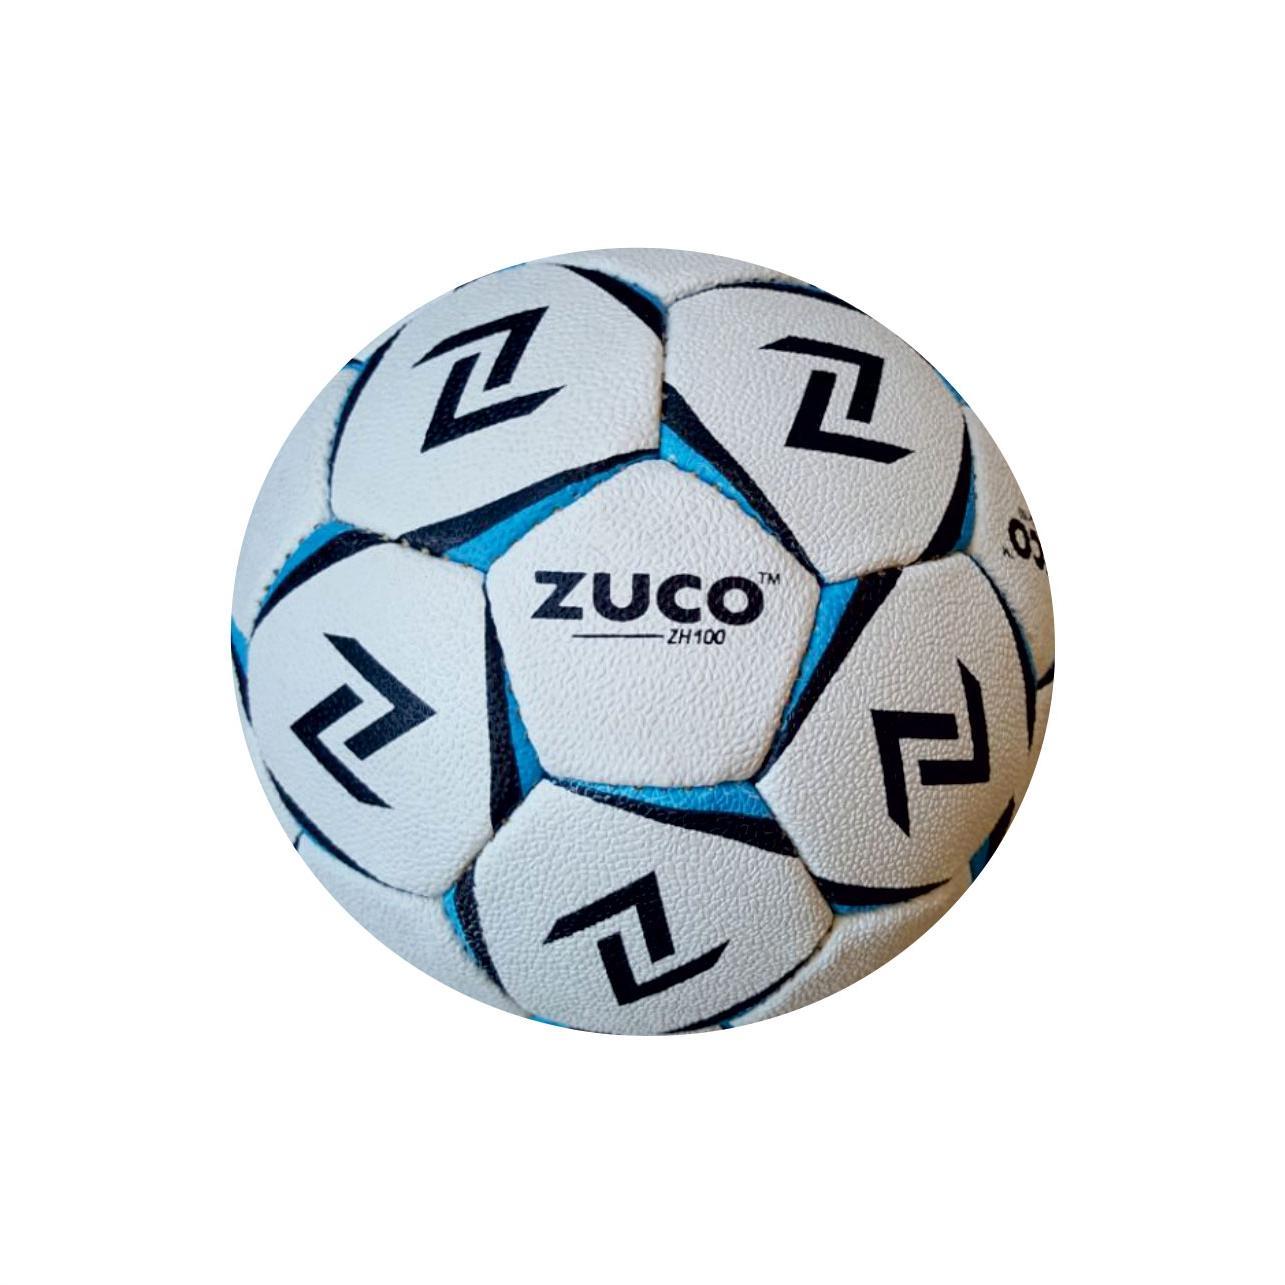 Zuco Dibeke / Handball